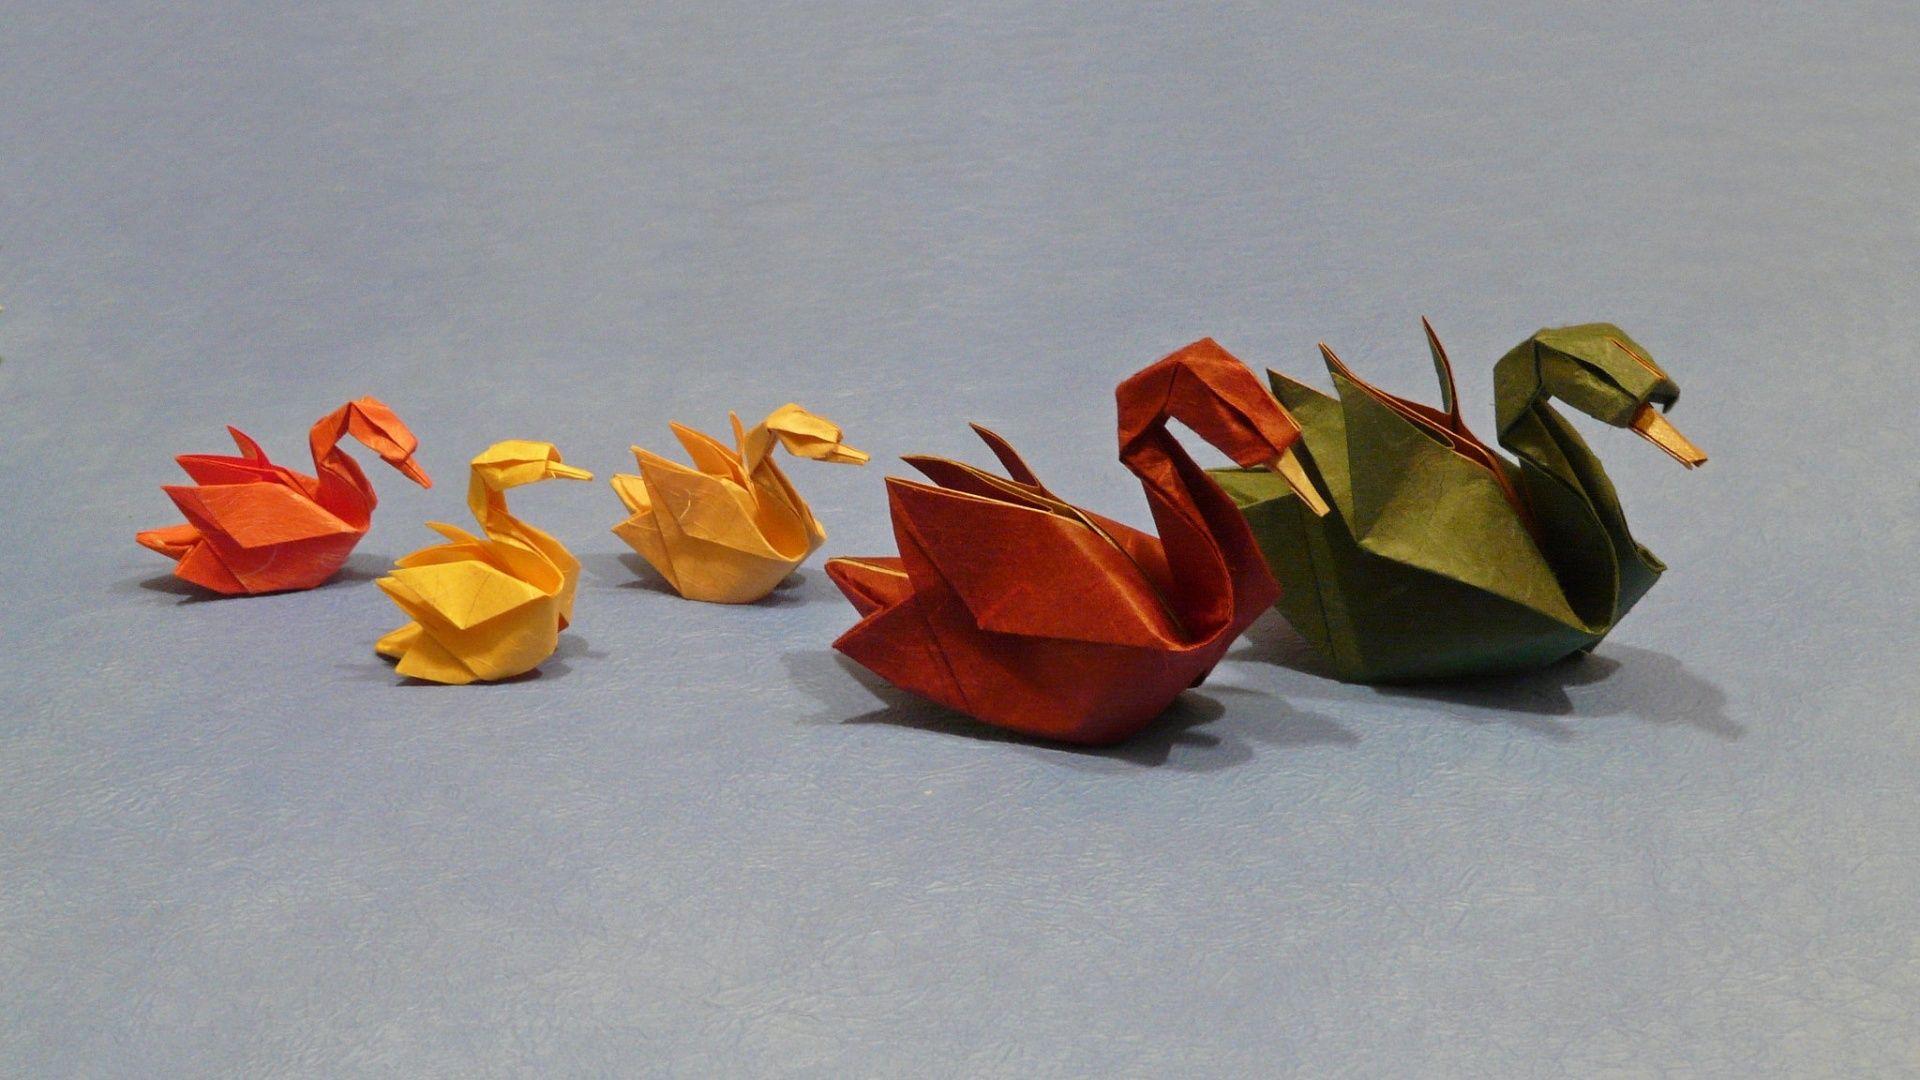 Origami free image